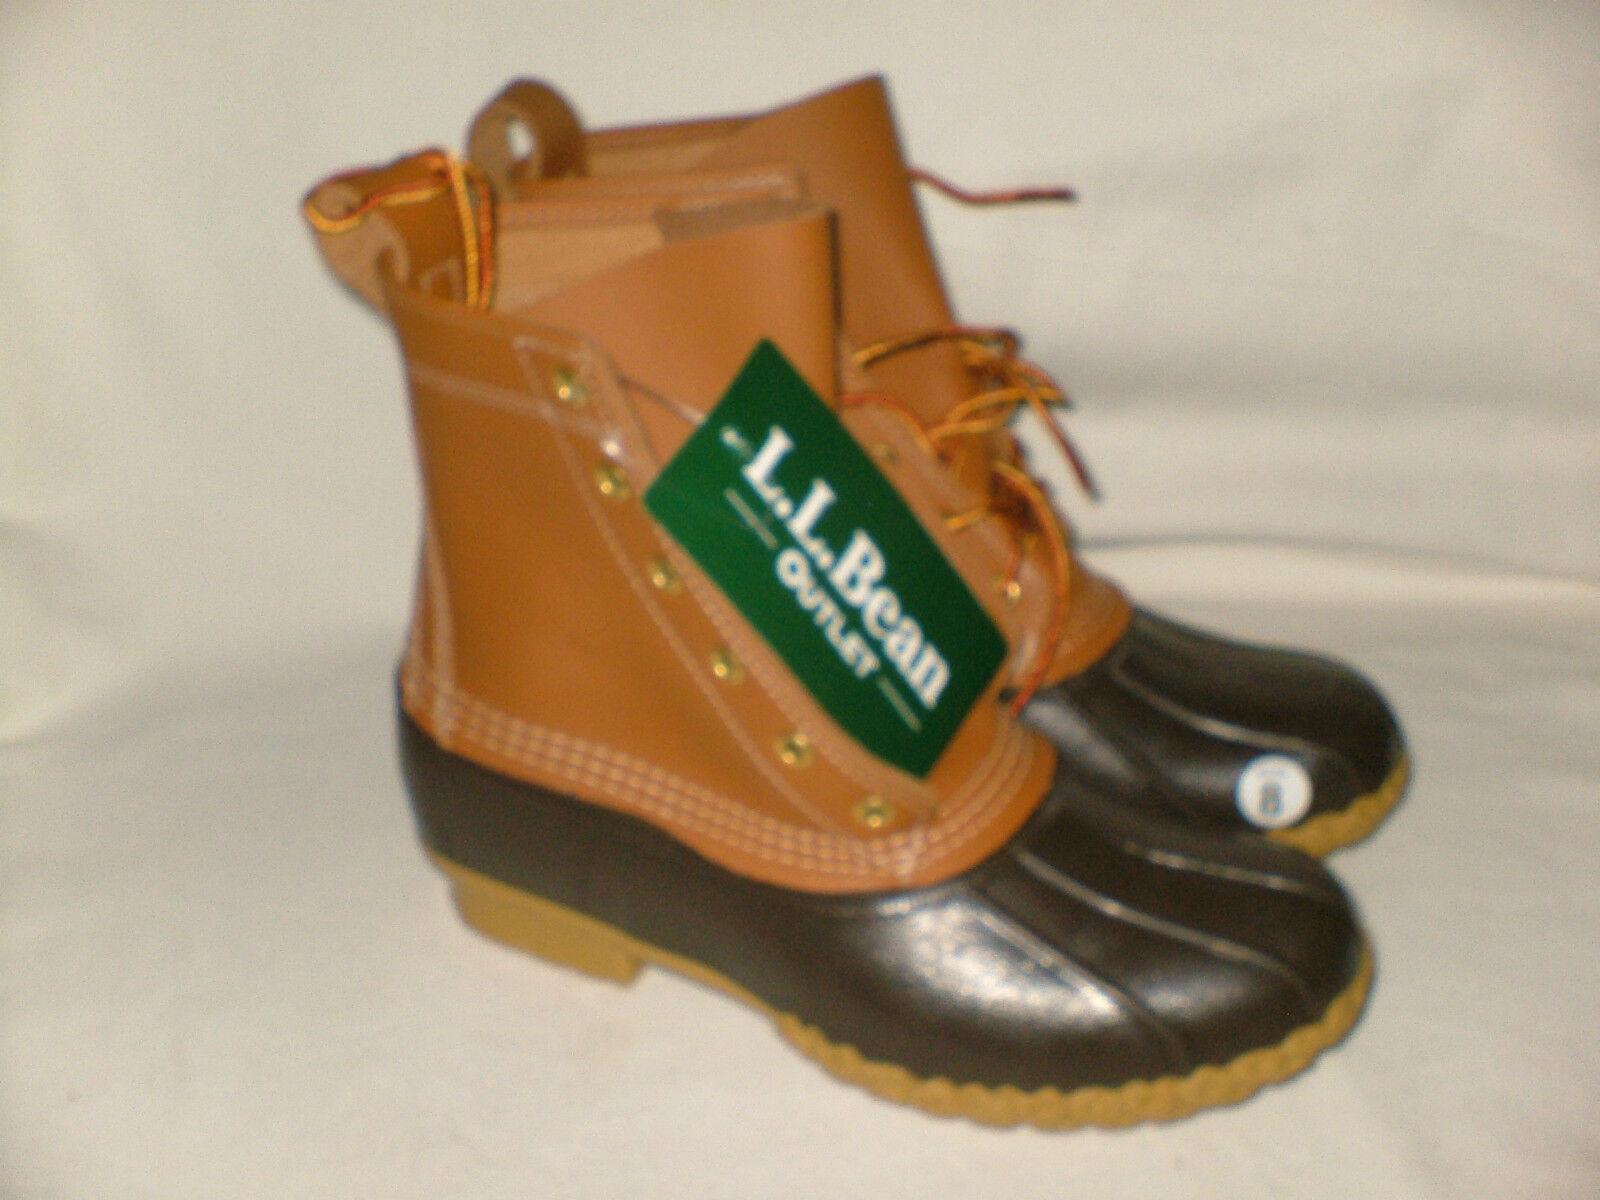 LL Bean Womens 8  Leather Duck Boots Beige Beige Beige Tan Brown Sz 7 fits Sz 8 Medium New 049785